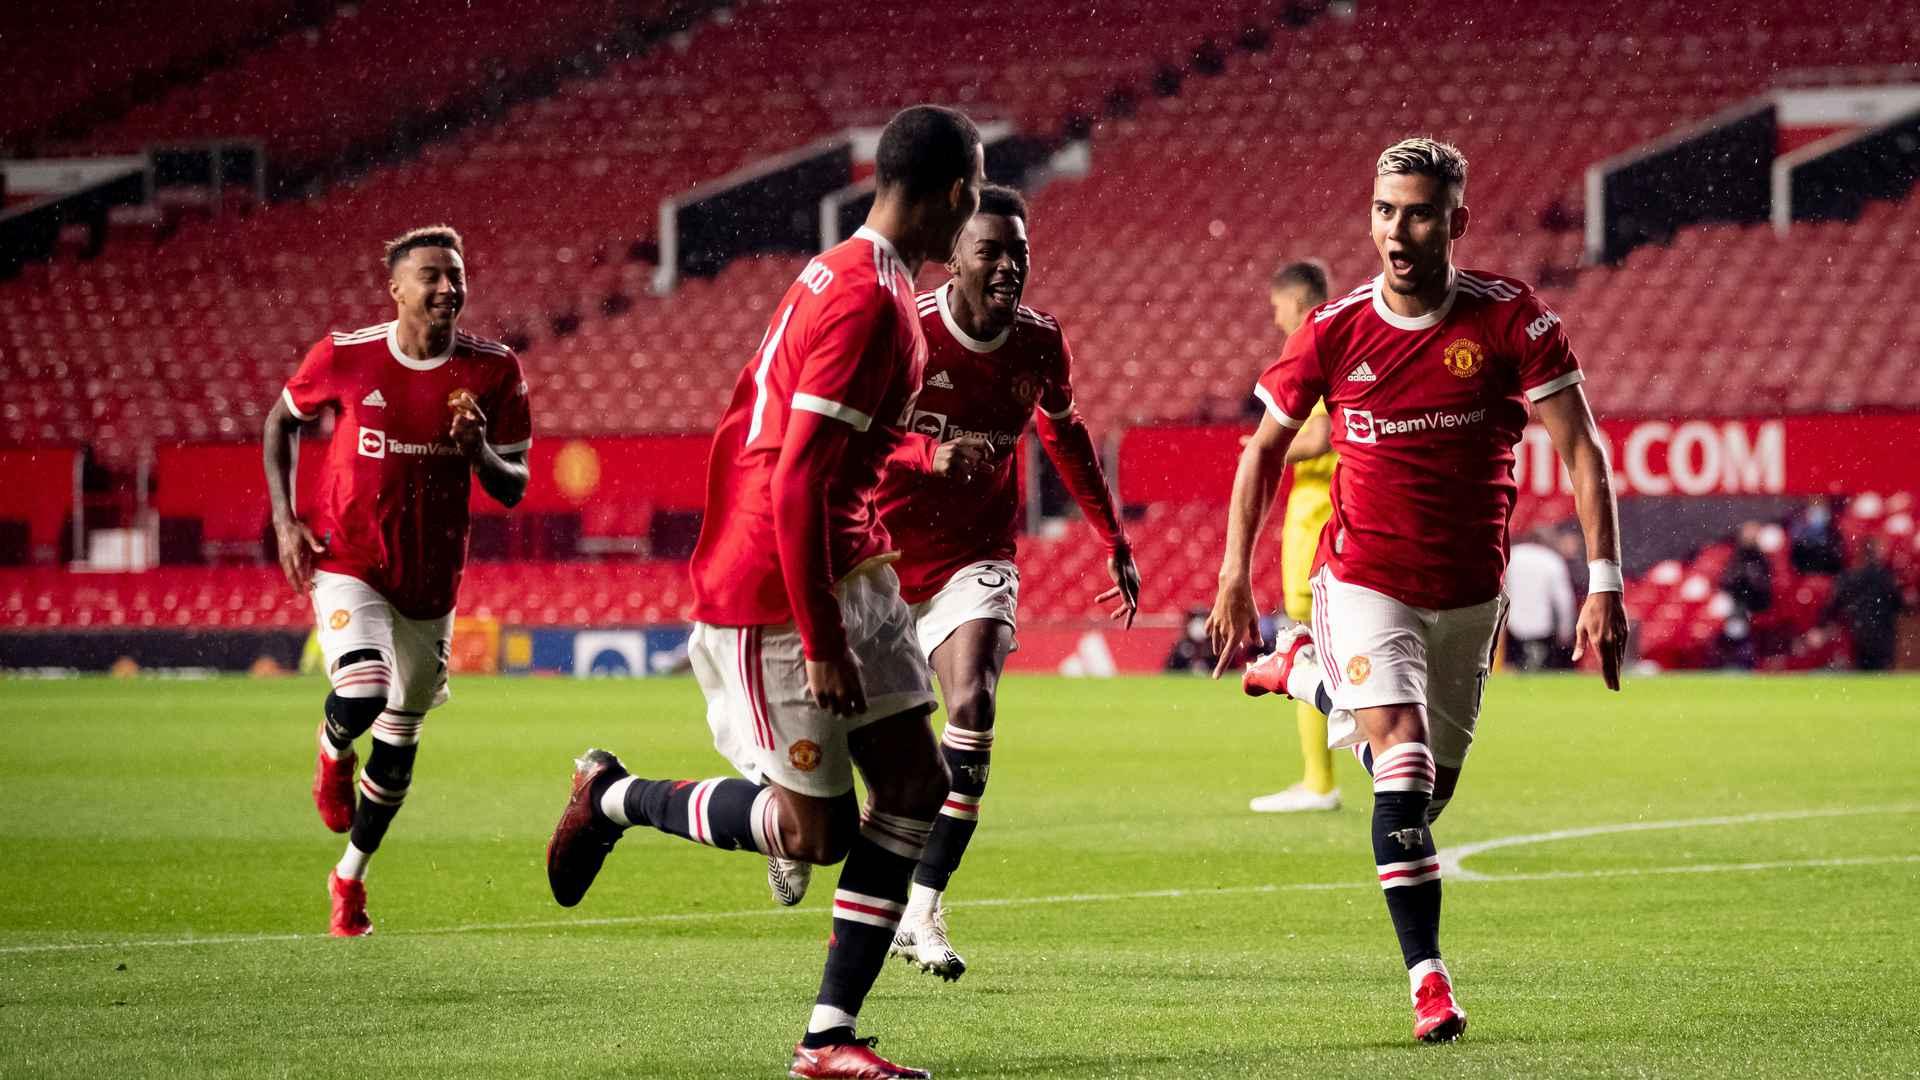 Match report: United 2 Brentford 2